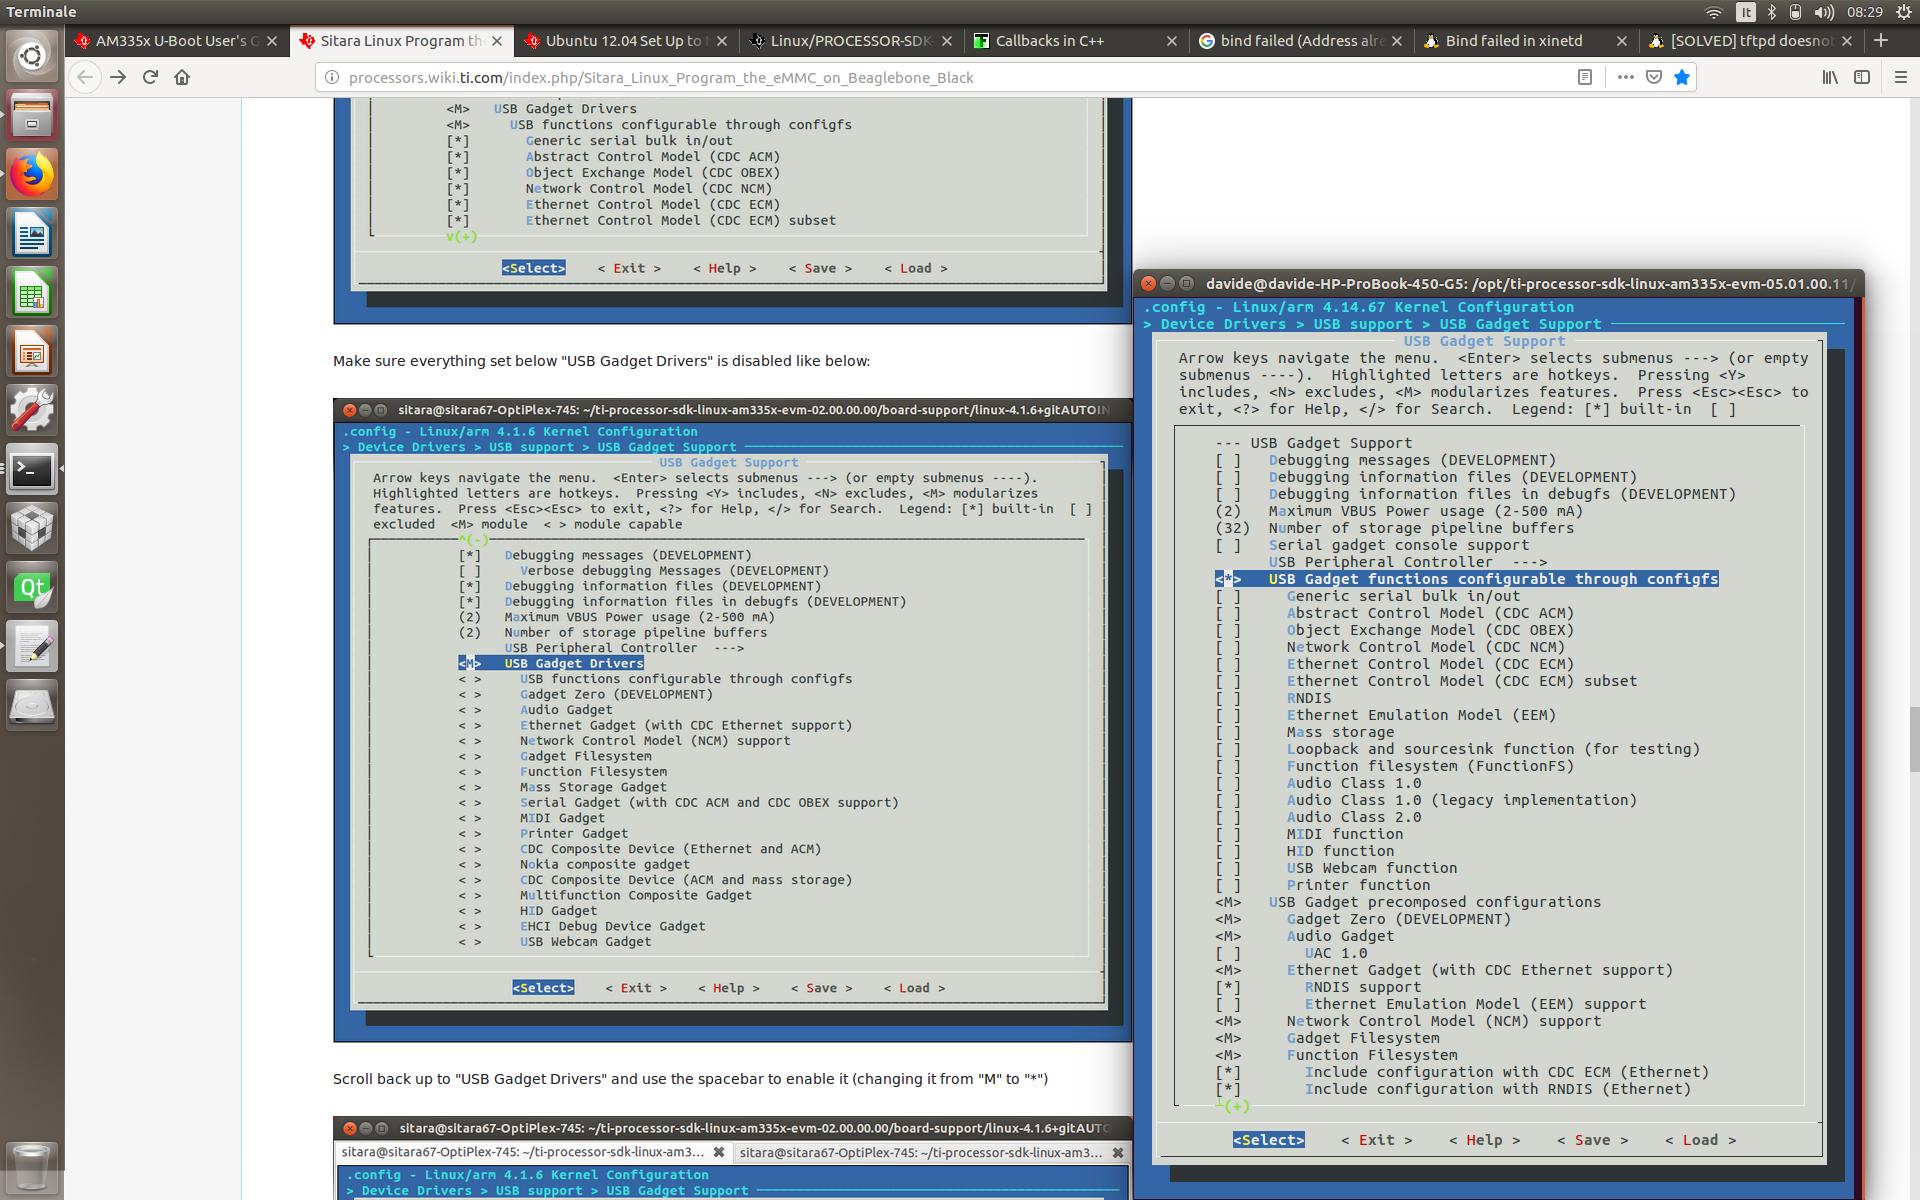 Resolved] Linux/PROCESSOR-SDK-AM335X: Programming the eMMC